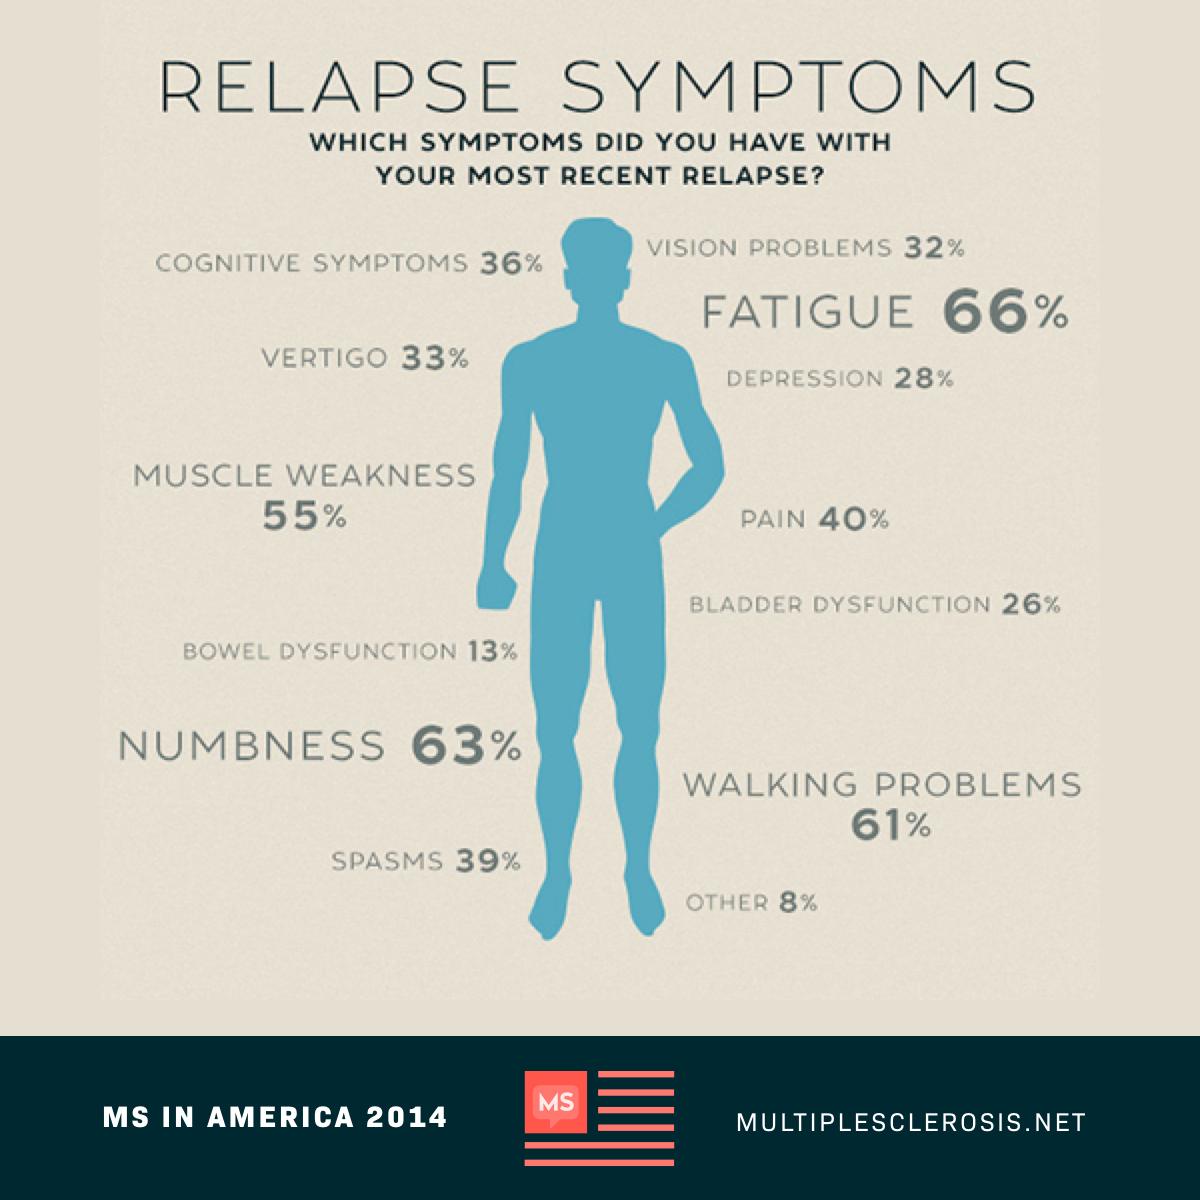 Relapse Symptoms